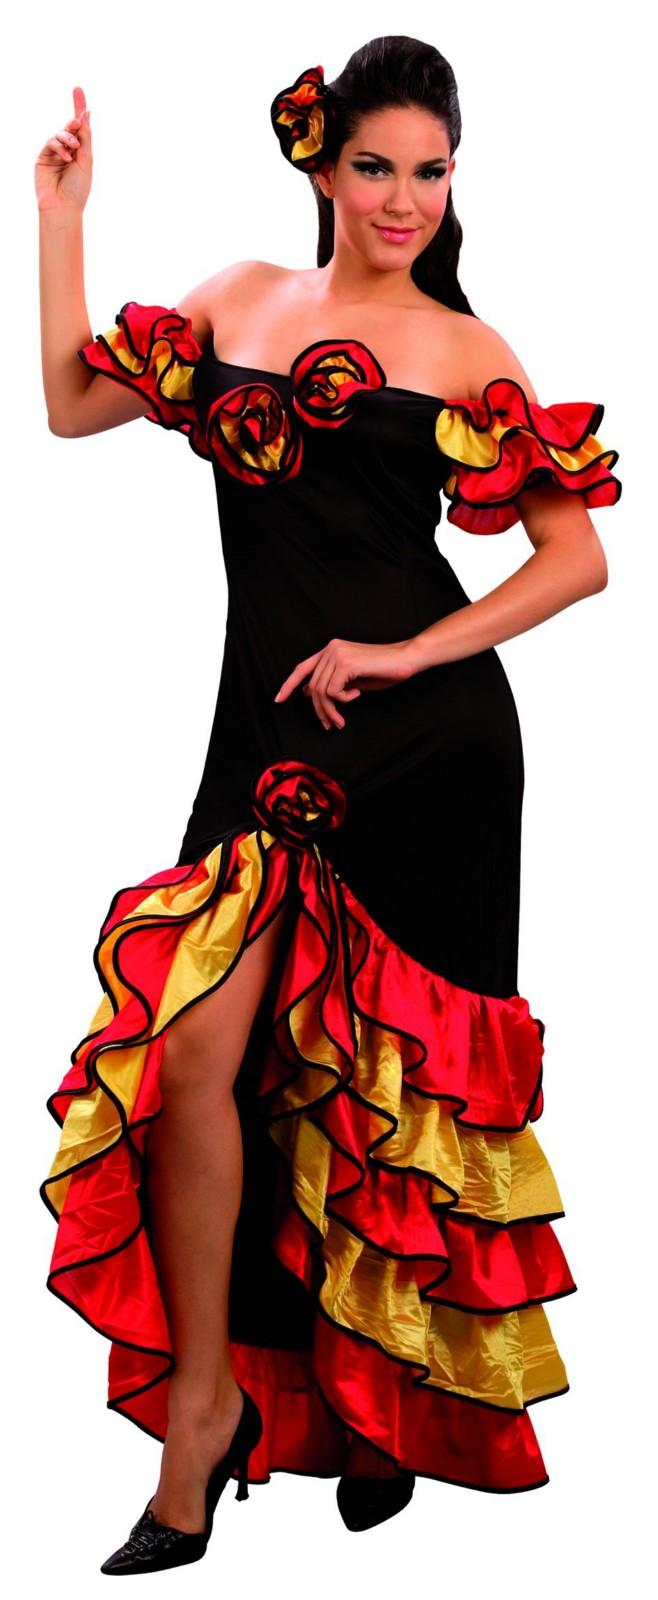 Strój dla dorosłych tancerka flamenco